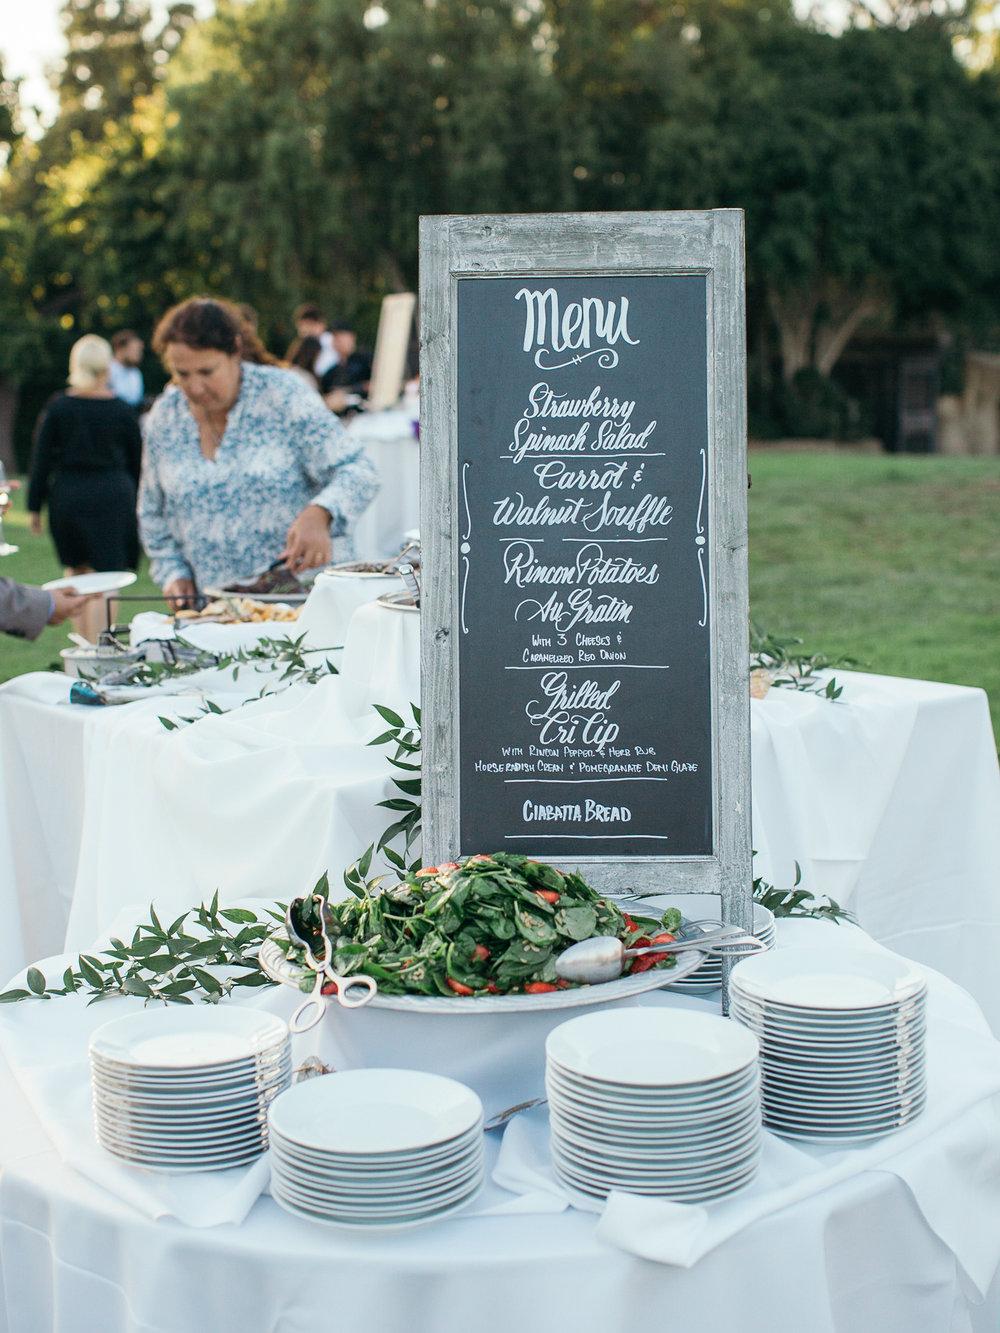 www.santabarbarawedding.com | Santa Barbara Zoo | Kiel Rucker | Rincon Catering | Reception Dinner Menu